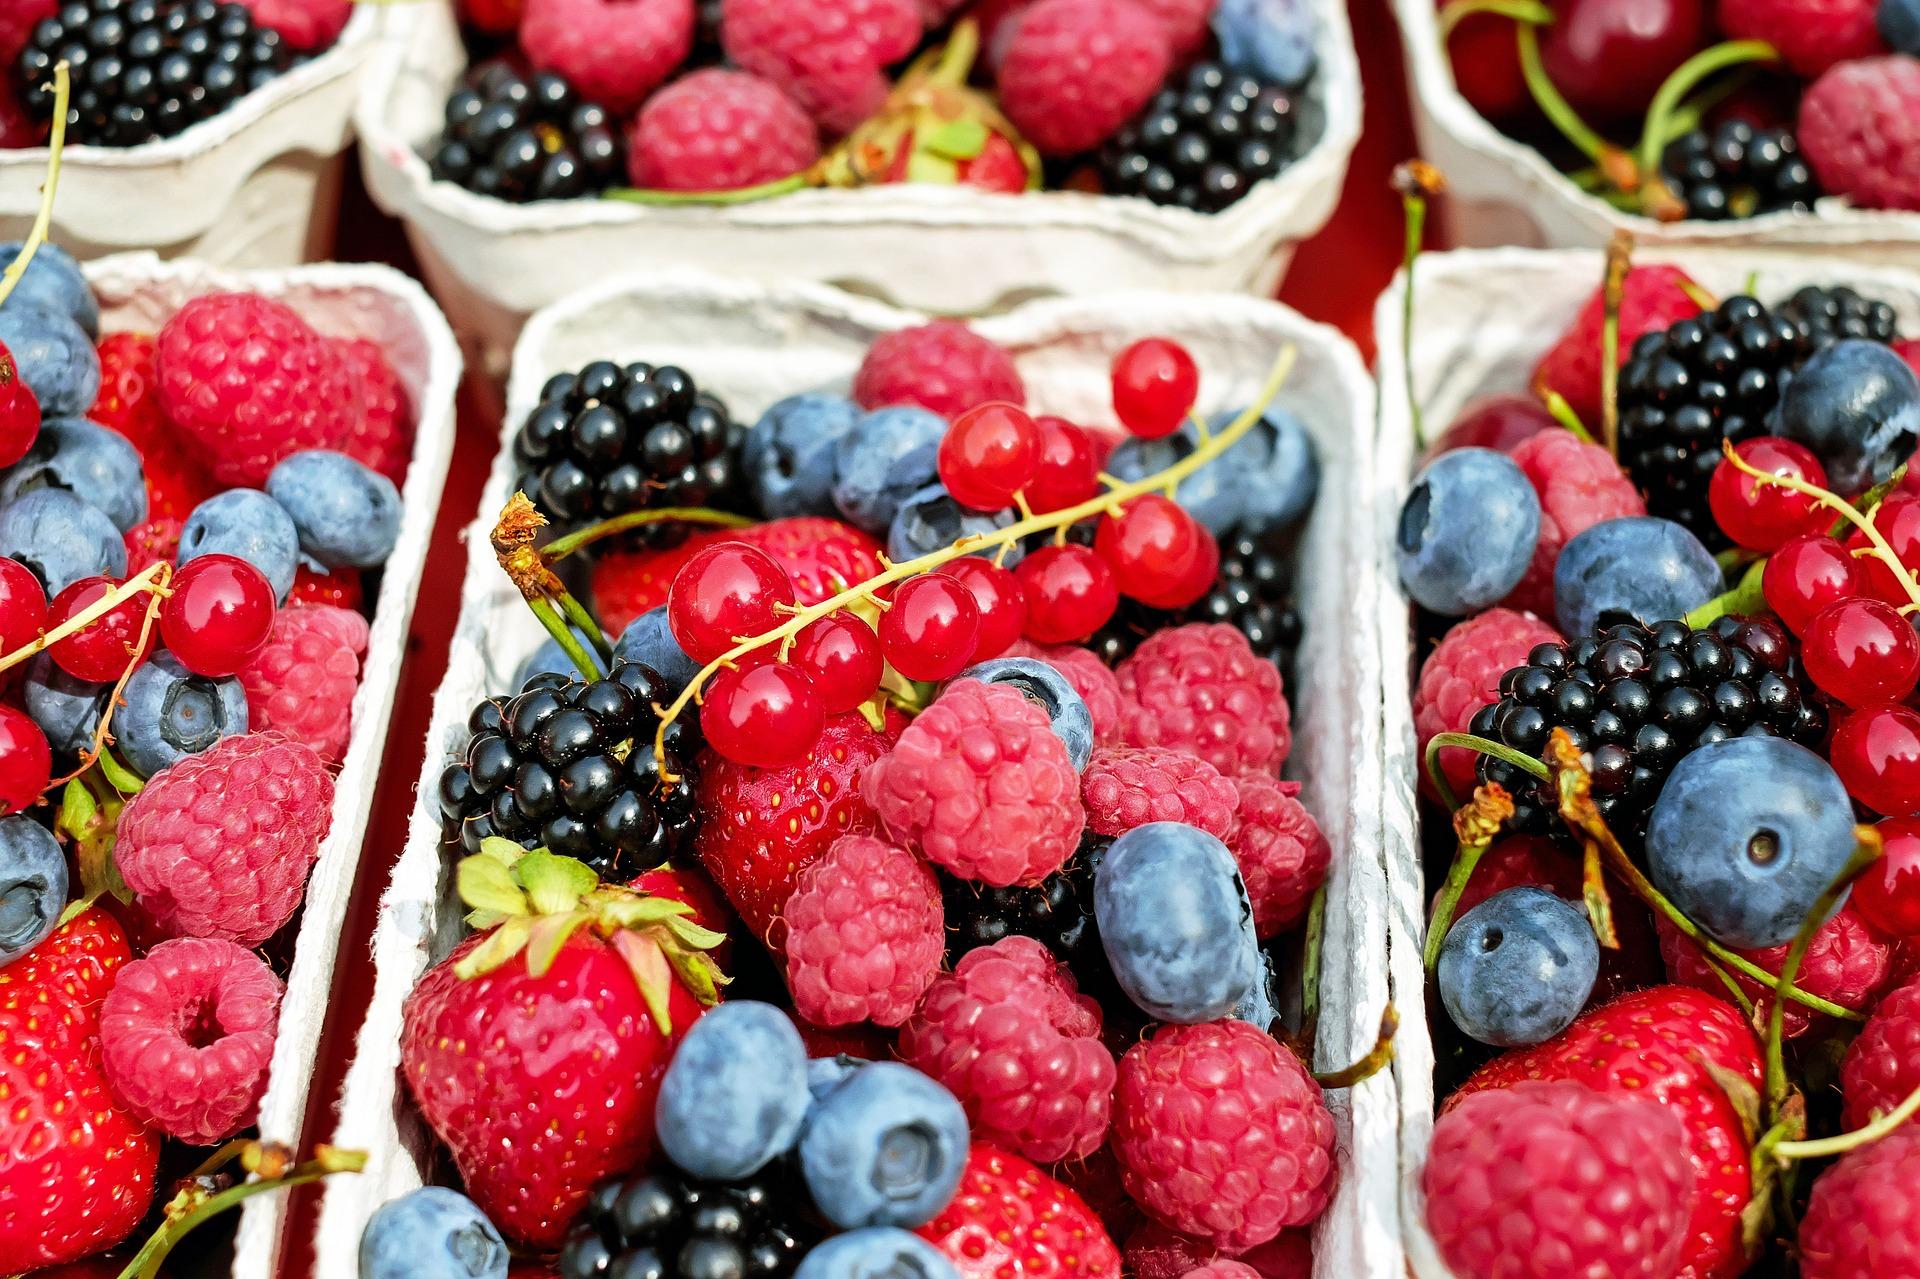 berries-1546125_1920